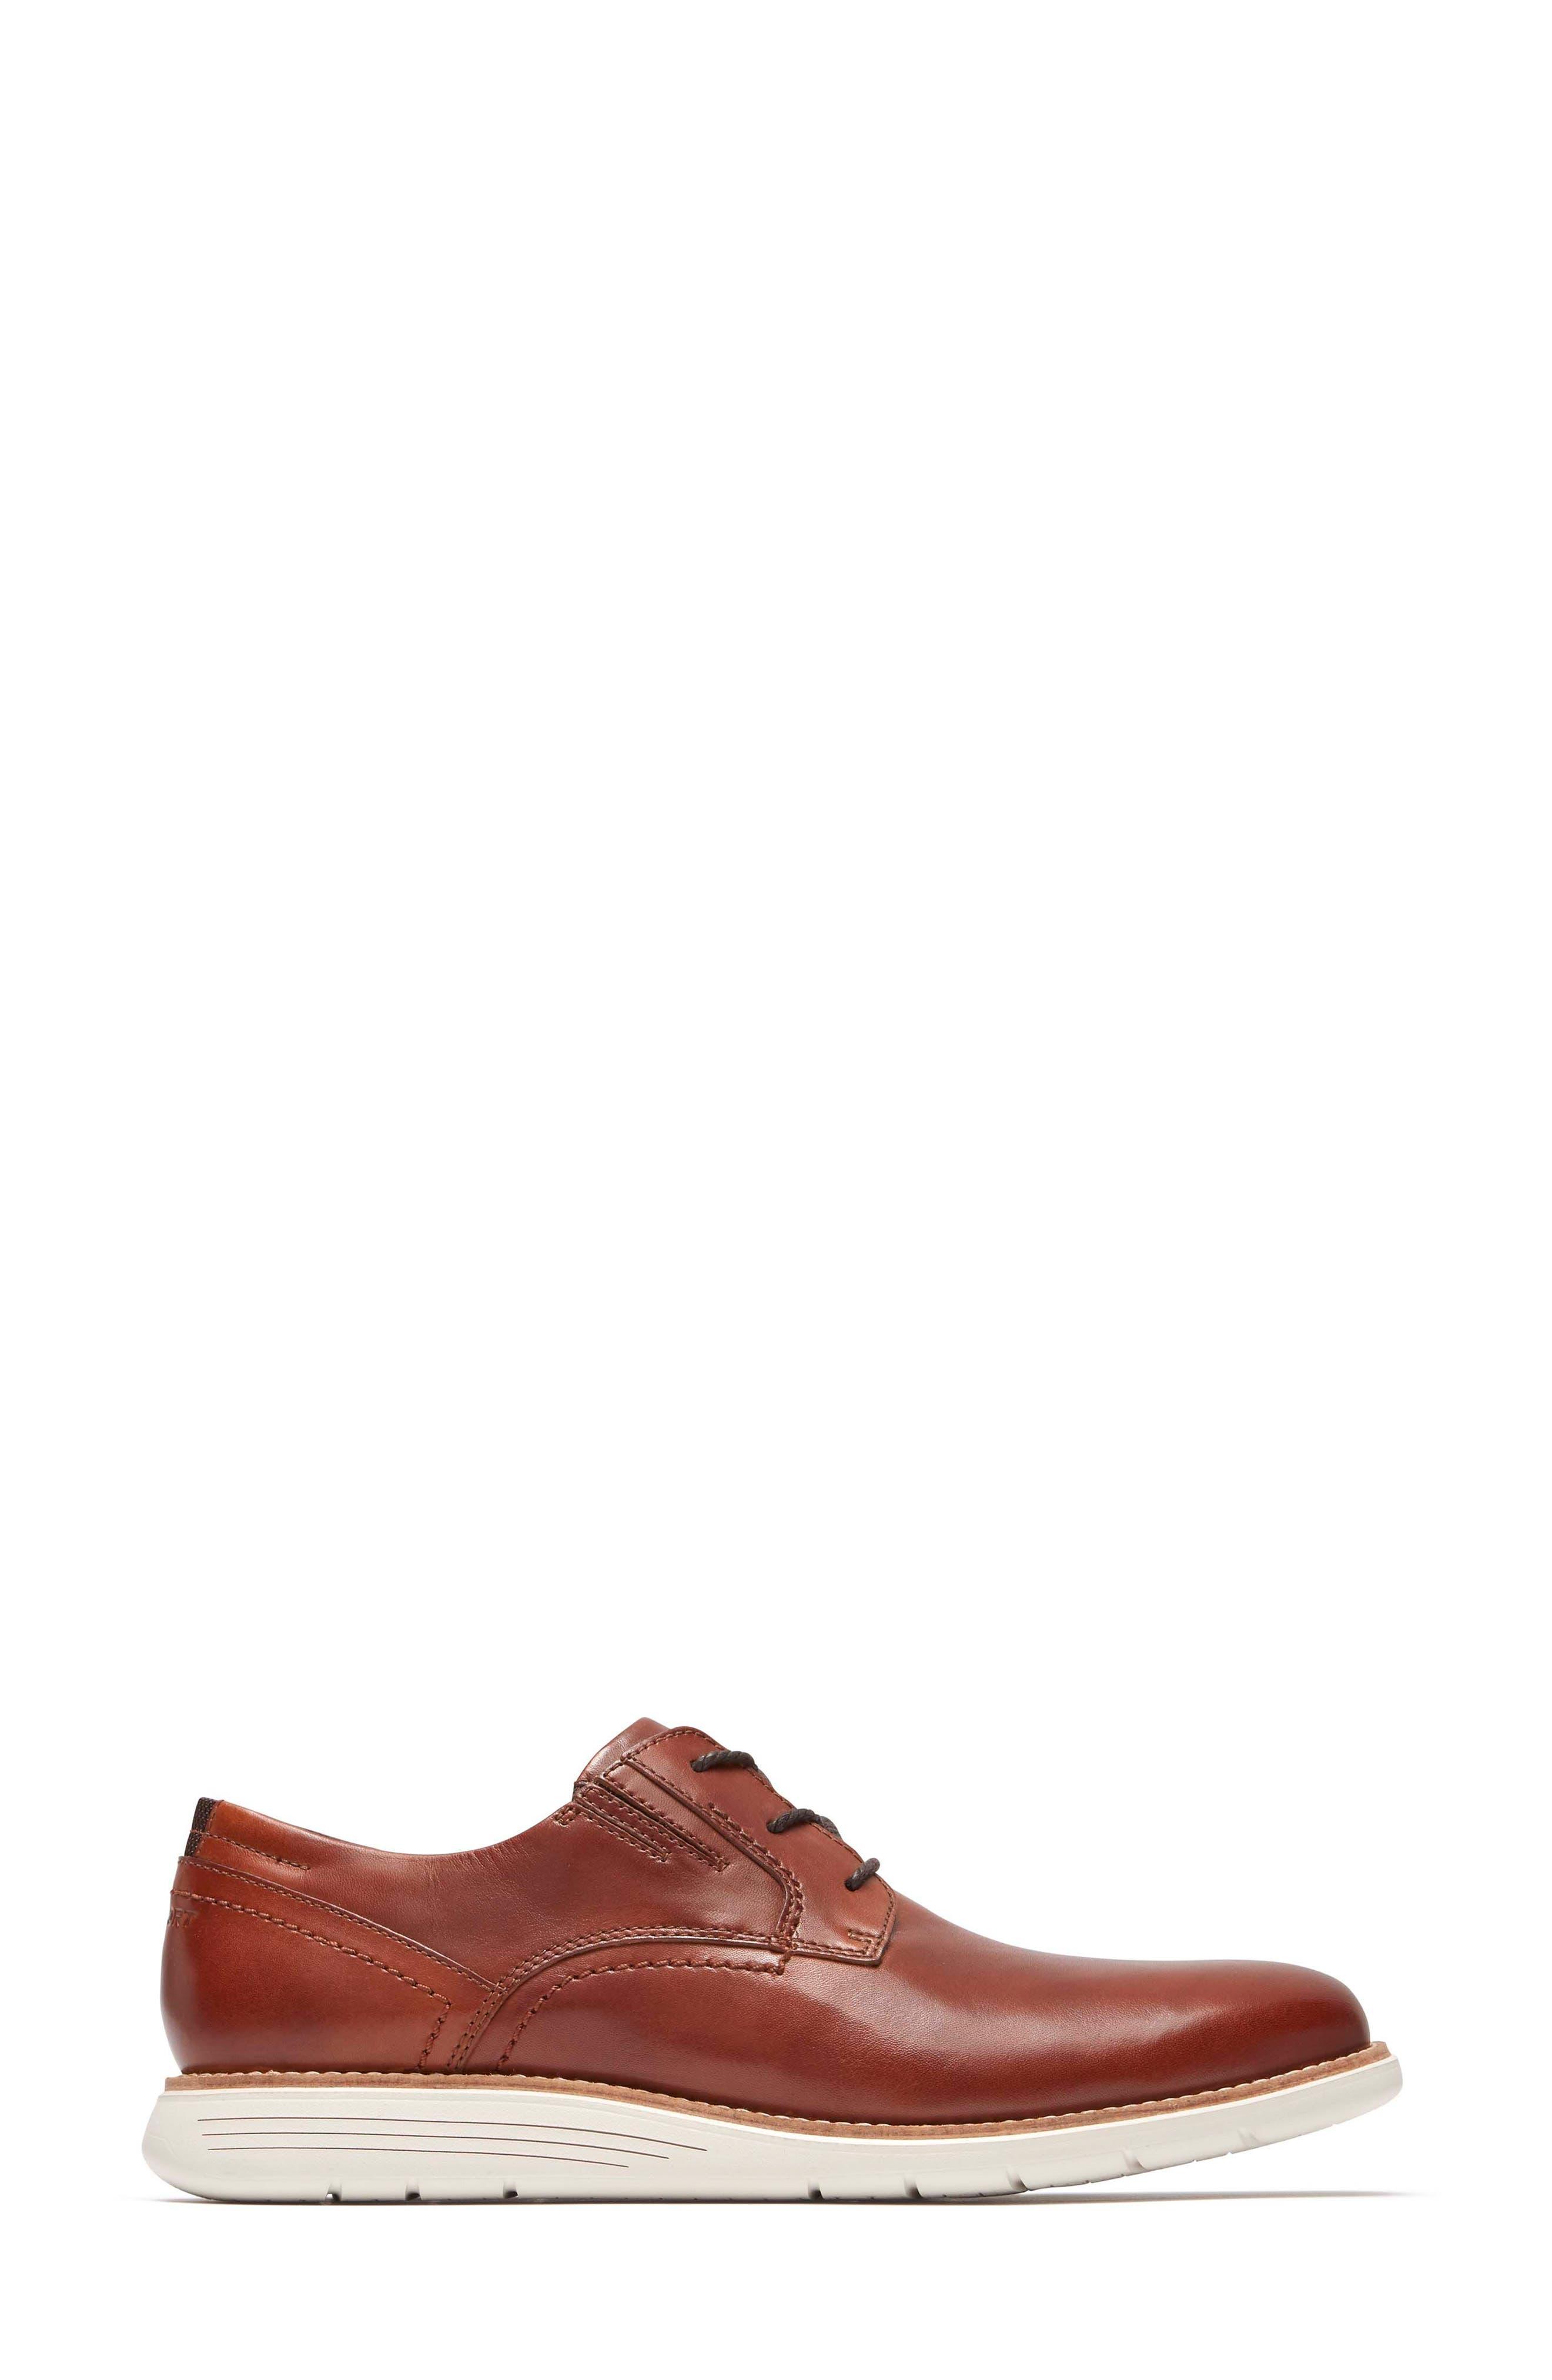 Total Motion Sport Plain Toe Derby,                             Alternate thumbnail 3, color,                             Tan Leather